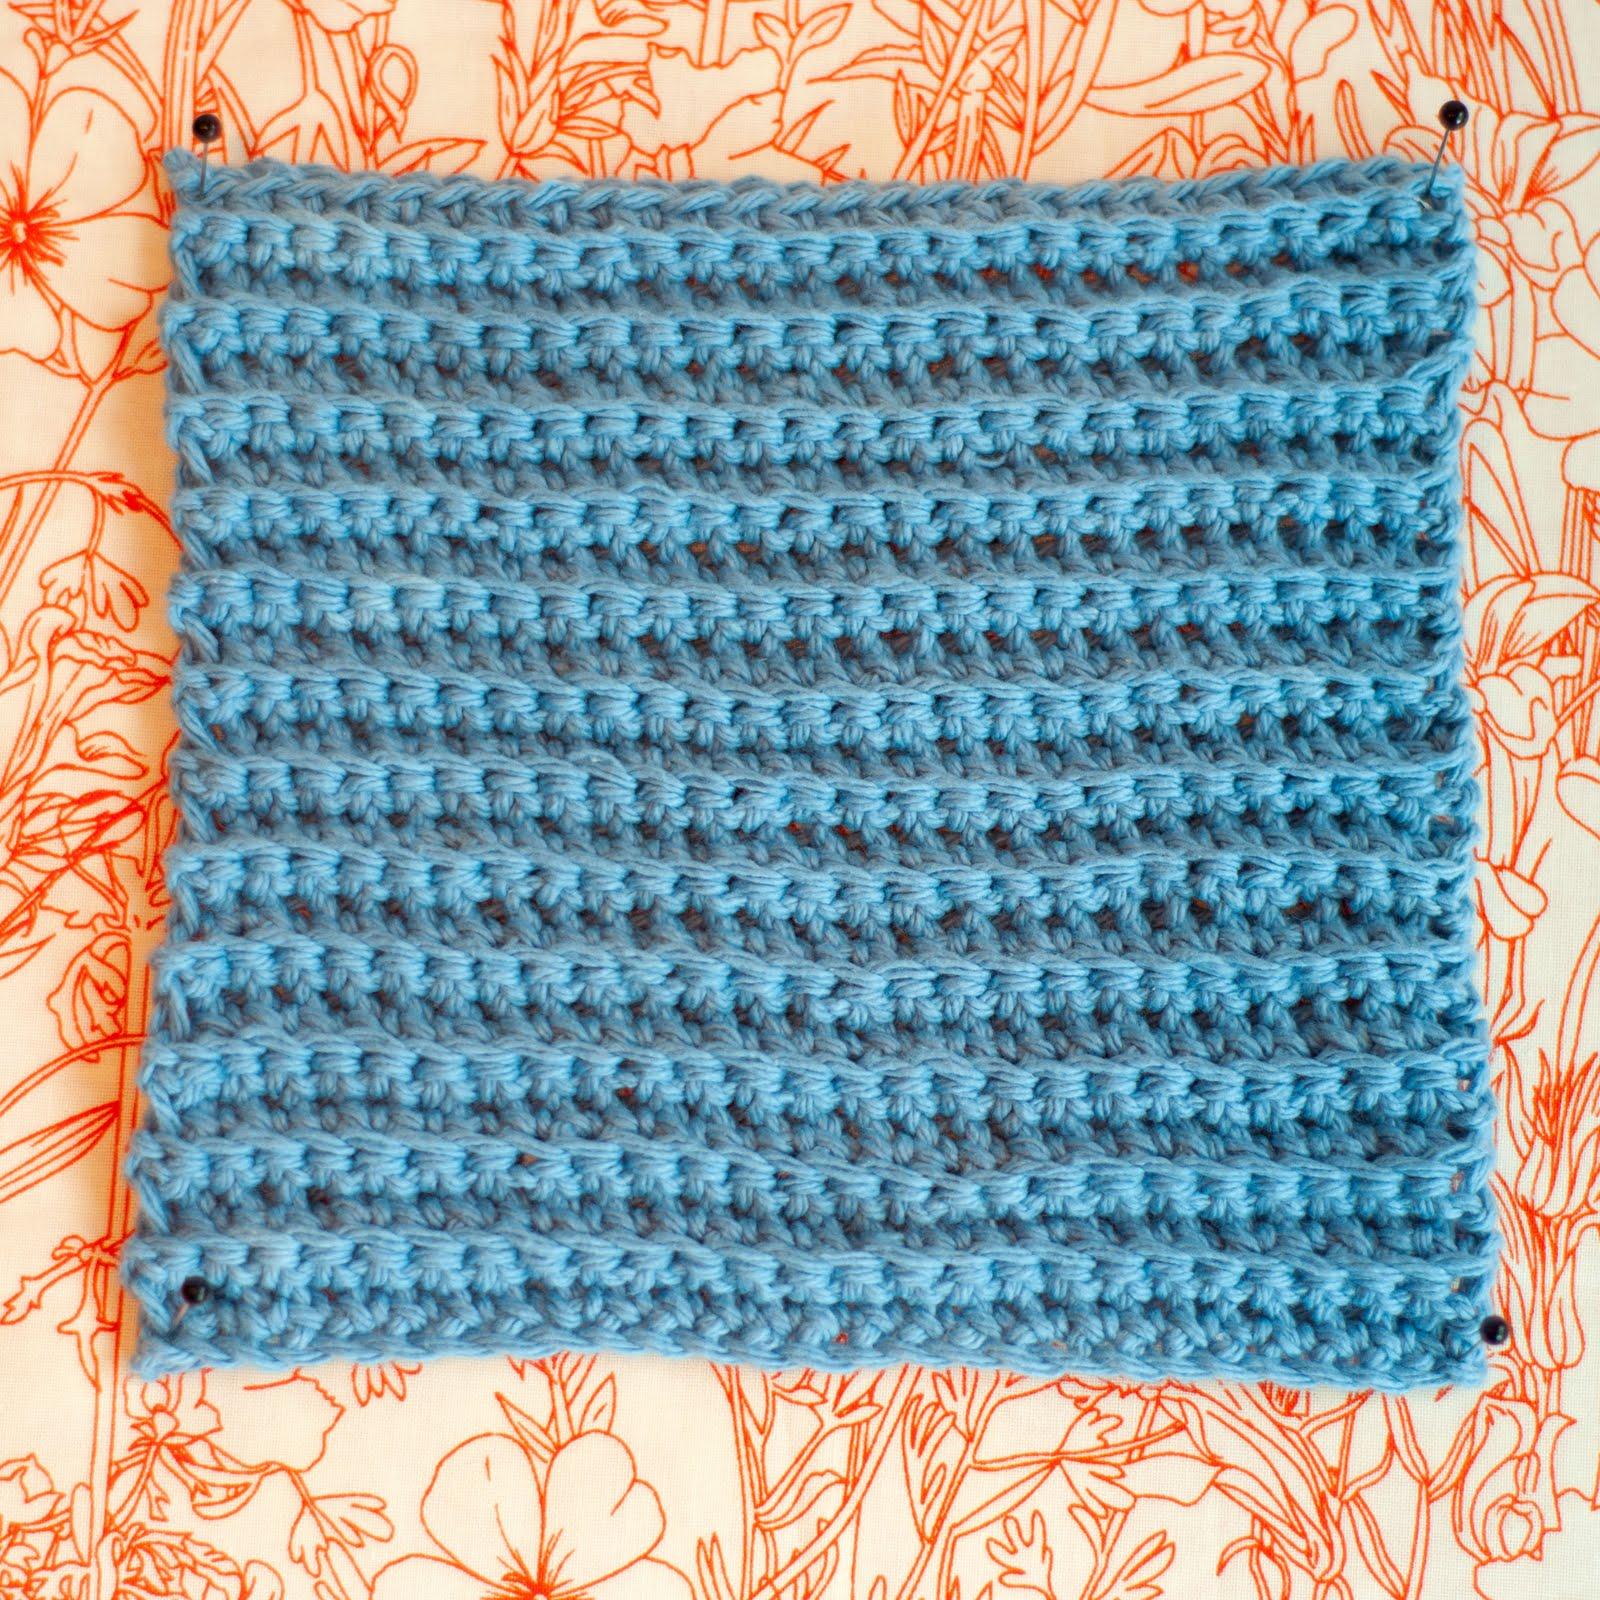 Aesthetic Nest Crochet Ribbed Washcloths Tutorial